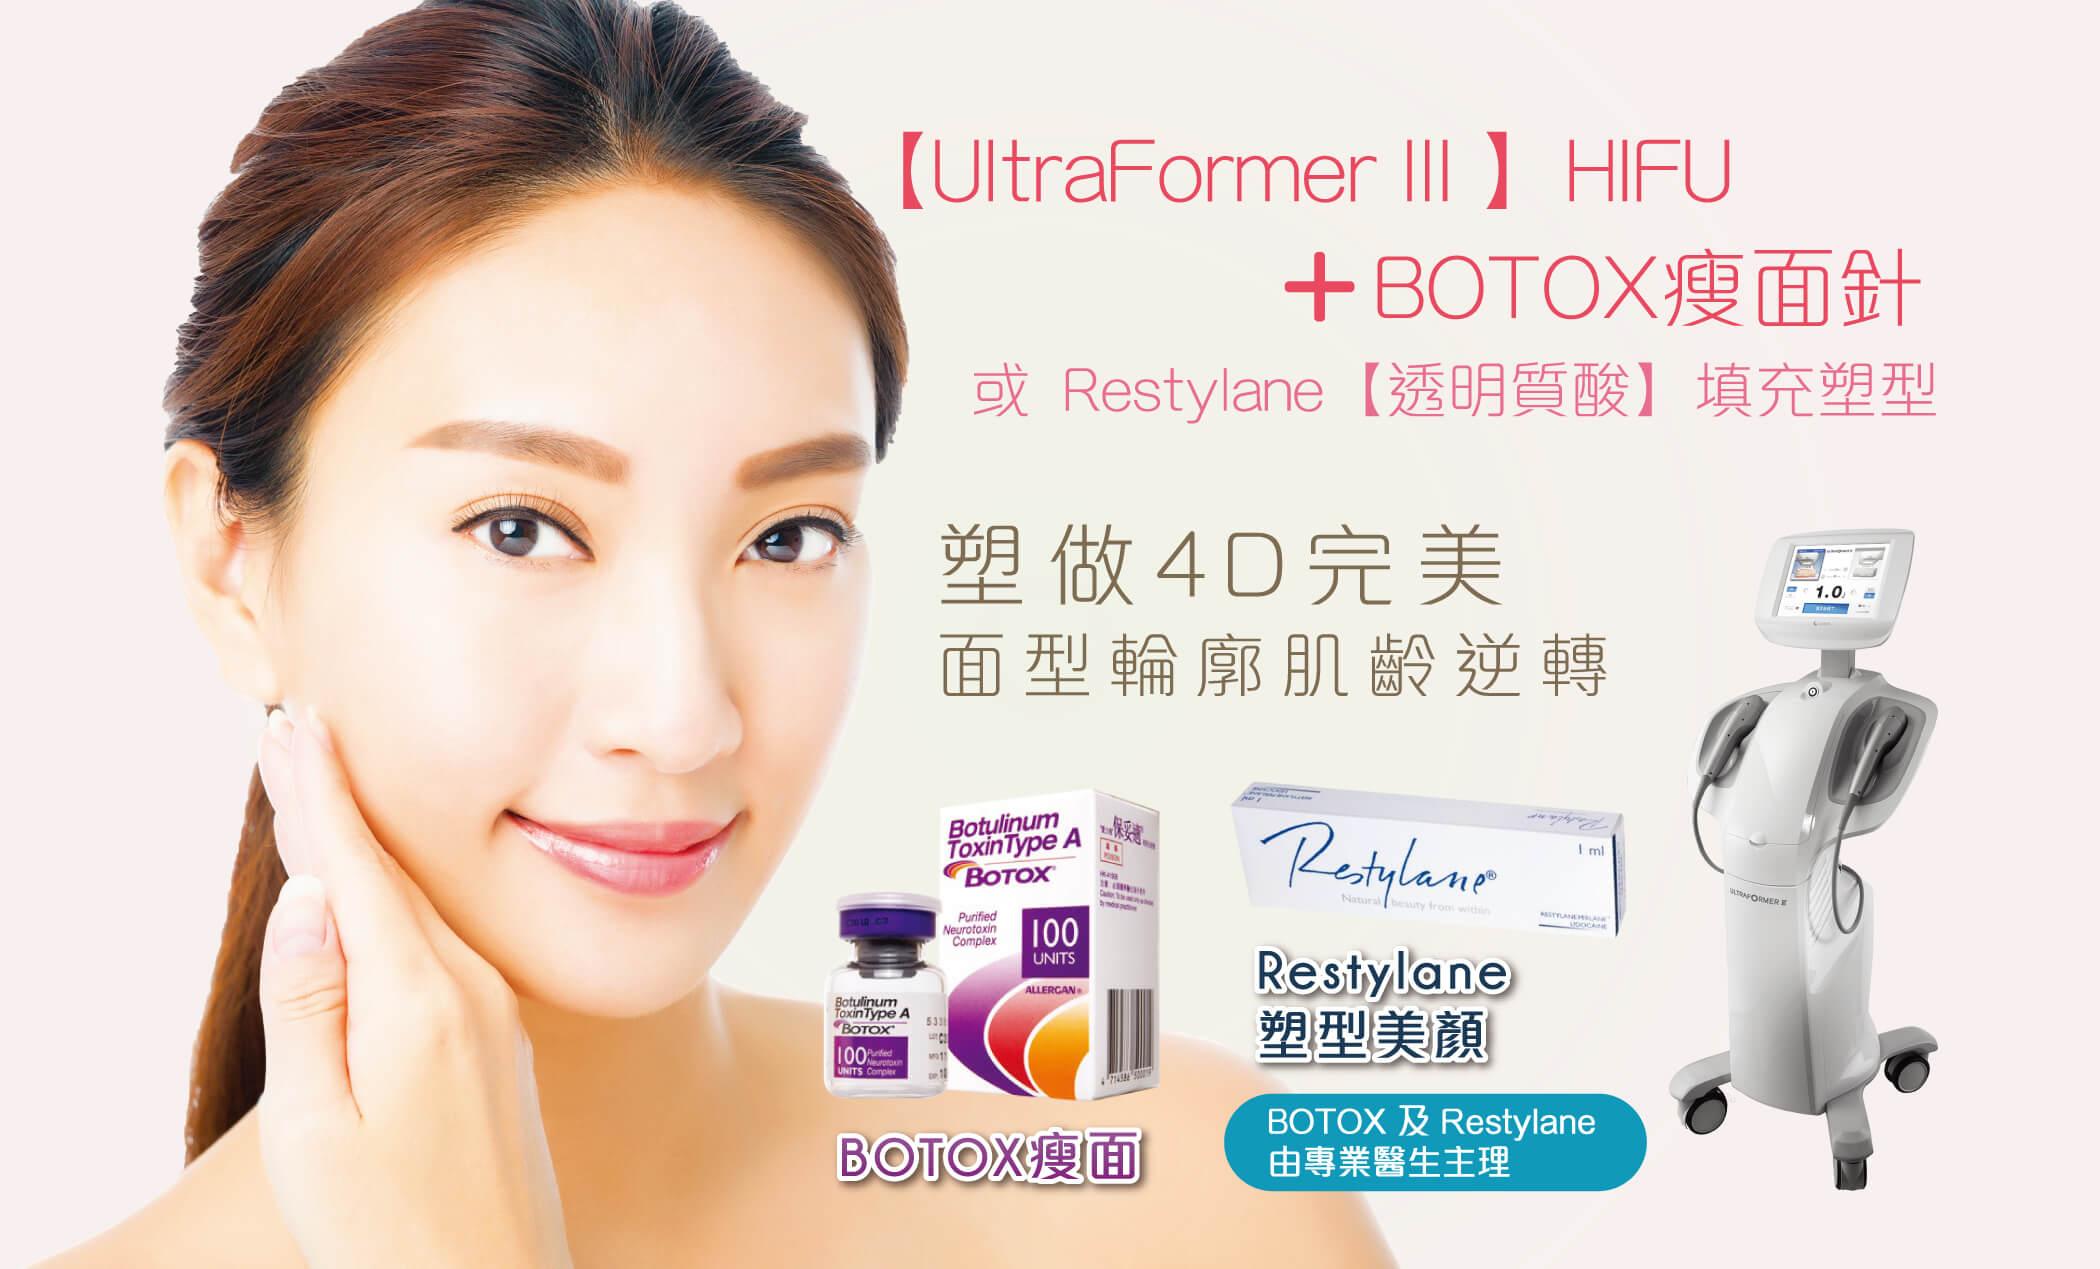 HIFU Botox